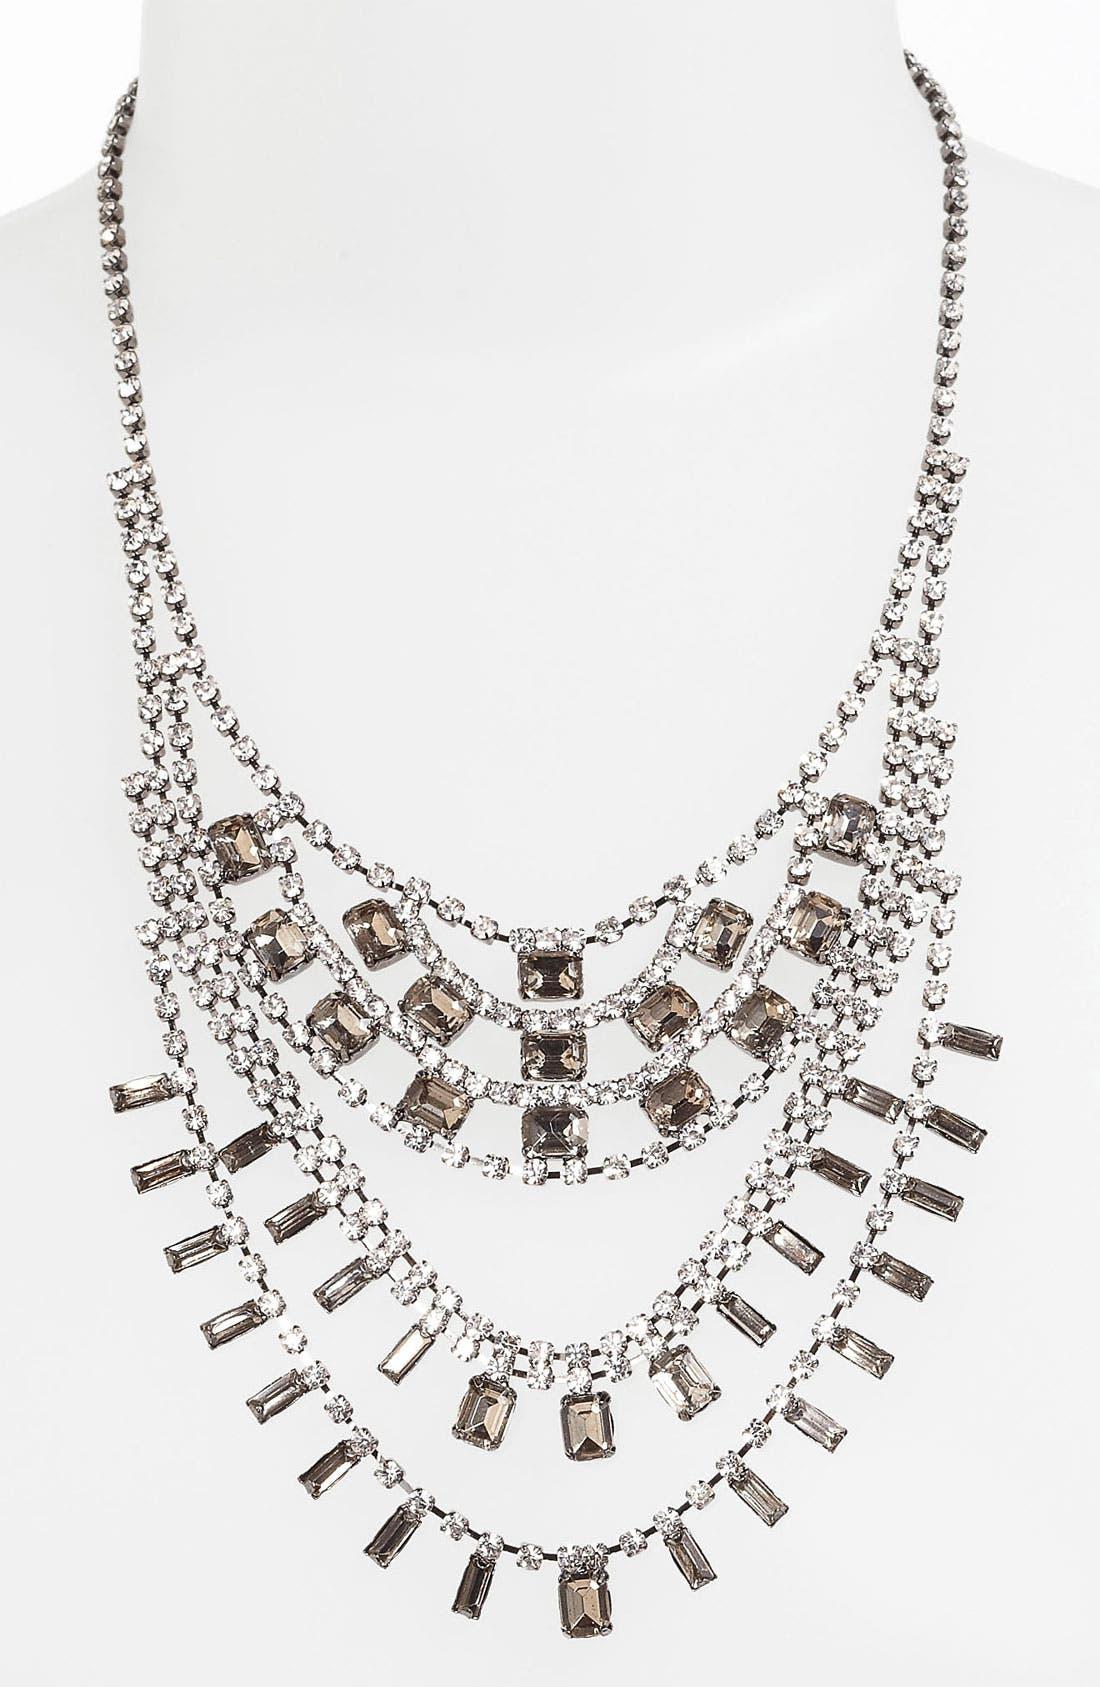 Alternate Image 1 Selected - BP. Vintage Rhinestone Bib Necklace